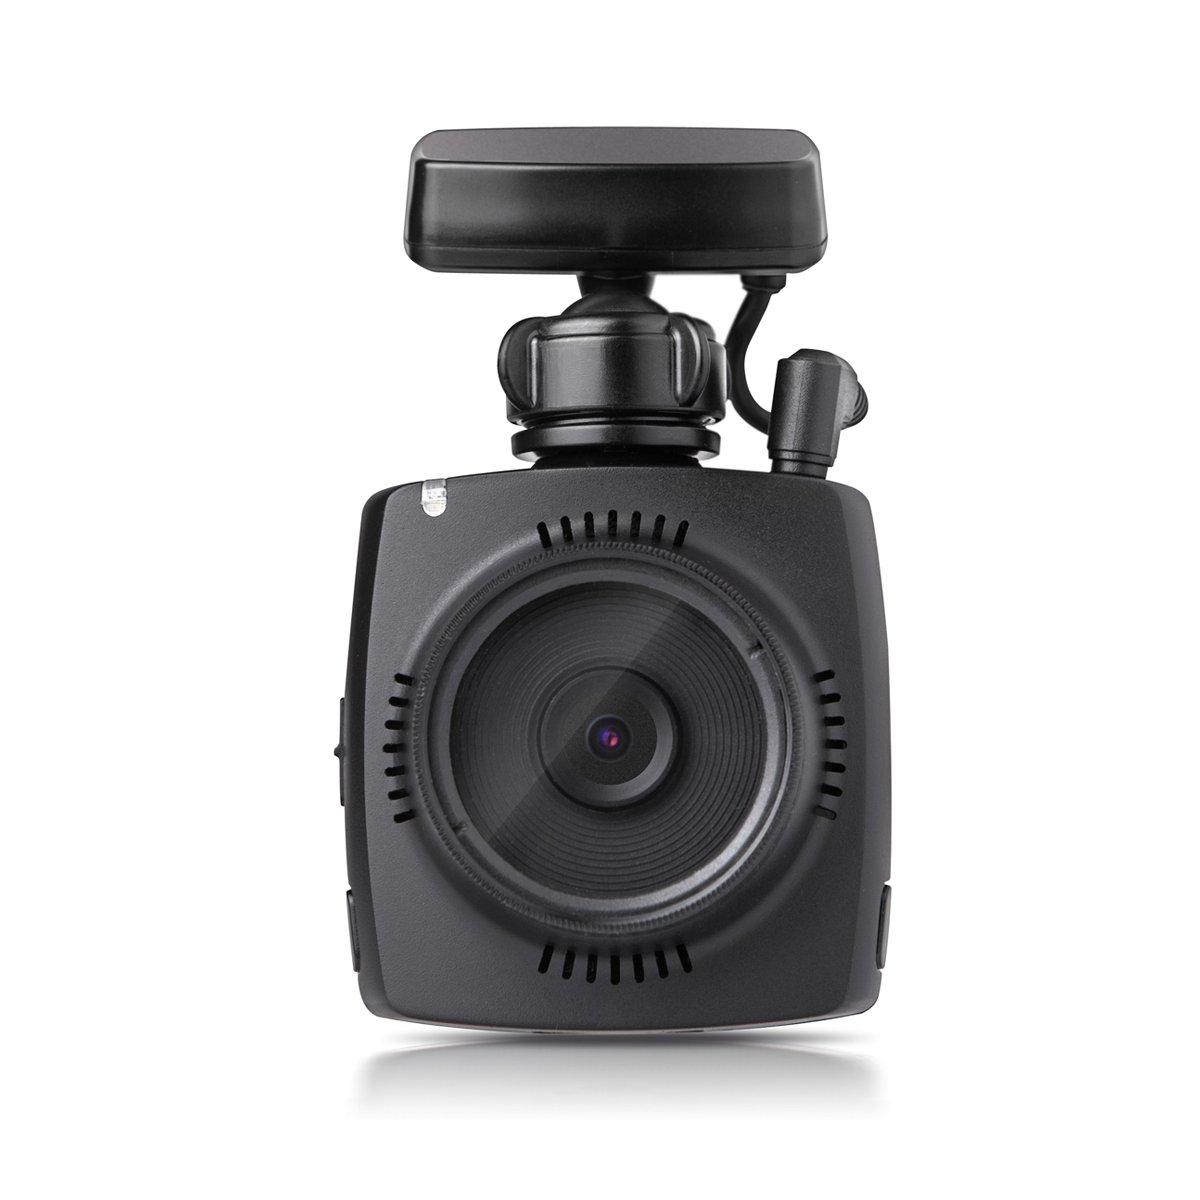 [Lukas]ドライブレコーダー/LK-7500 REAL /Sony Exmor CMOSセンサー搭載/Full HD (16GB) B00MGMLS2E 16GB  16GB